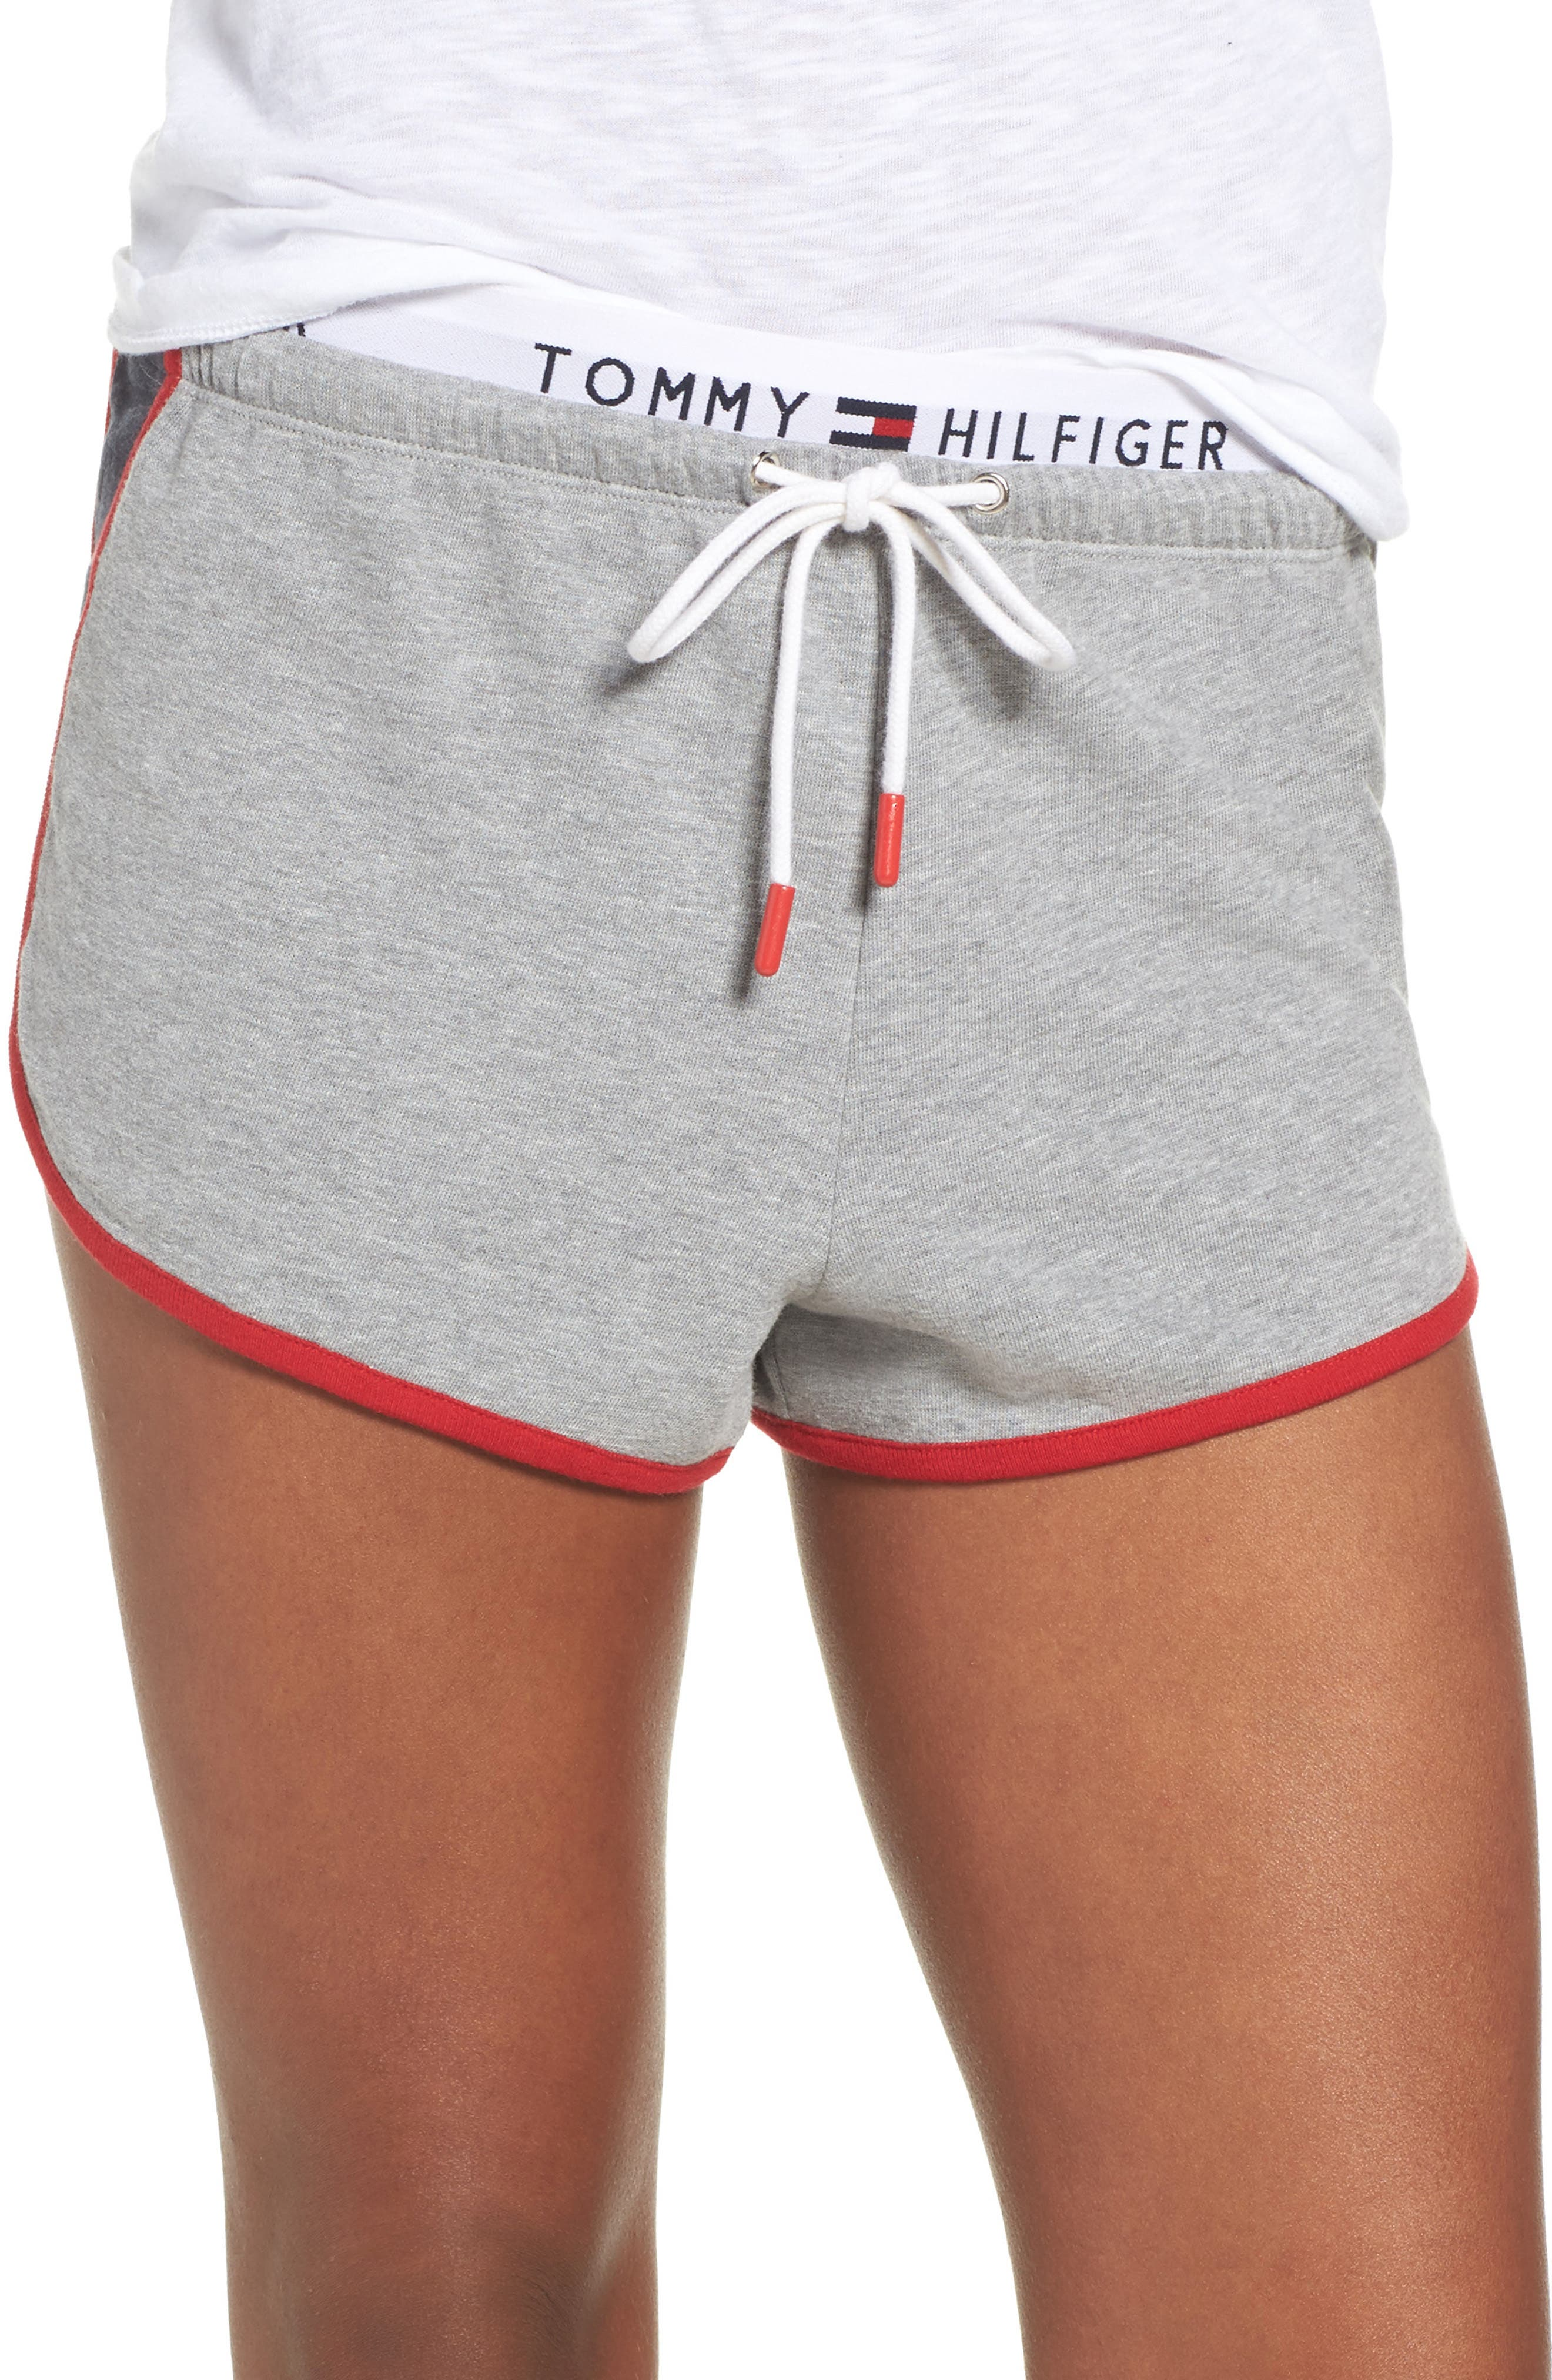 TH Retro Shorts,                             Main thumbnail 1, color,                             Heather Gray